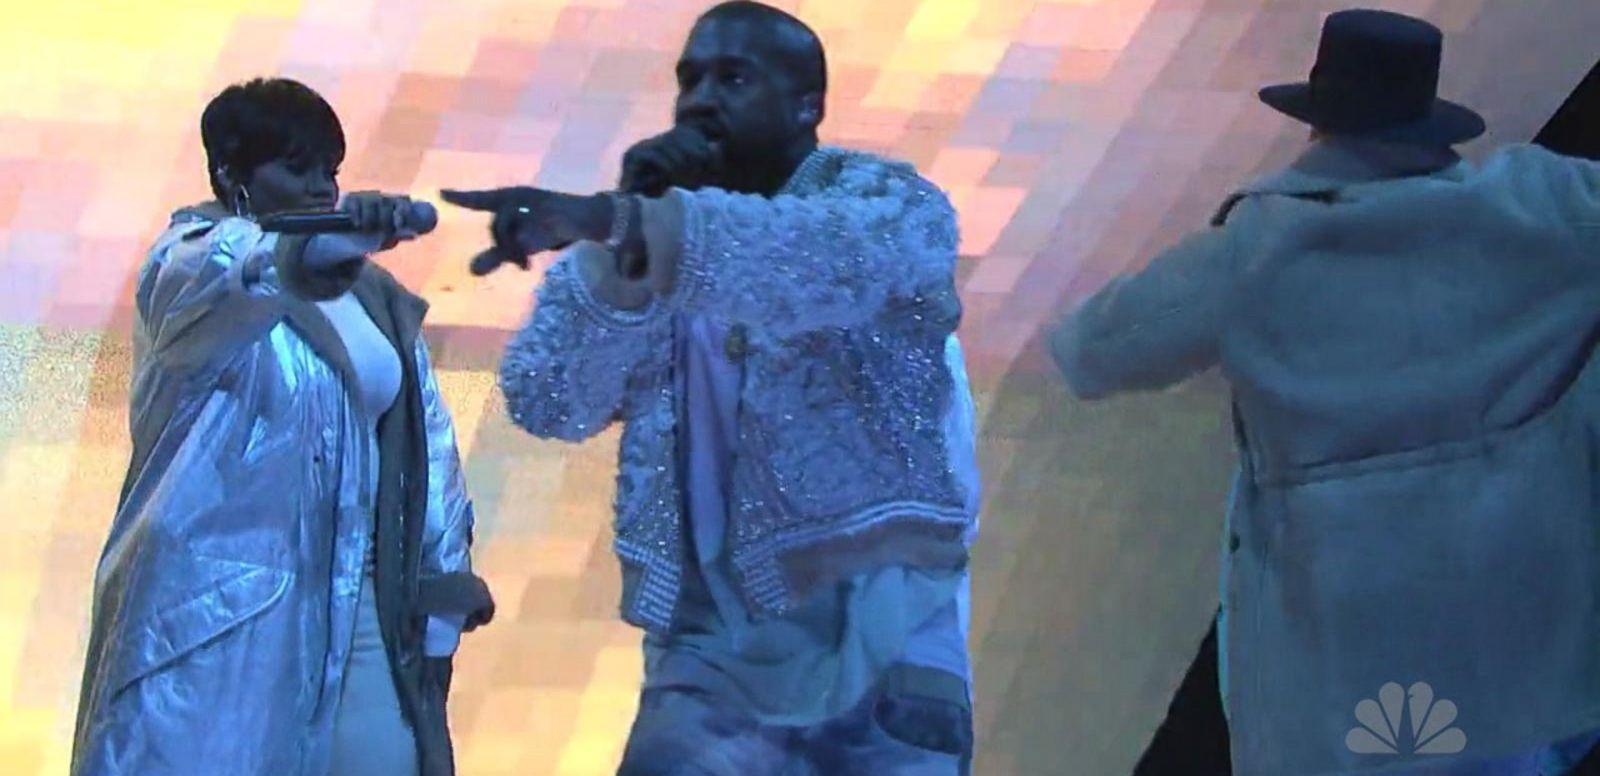 VIDEO: Kanye West Caught Having Saturday Night Live Meltdown